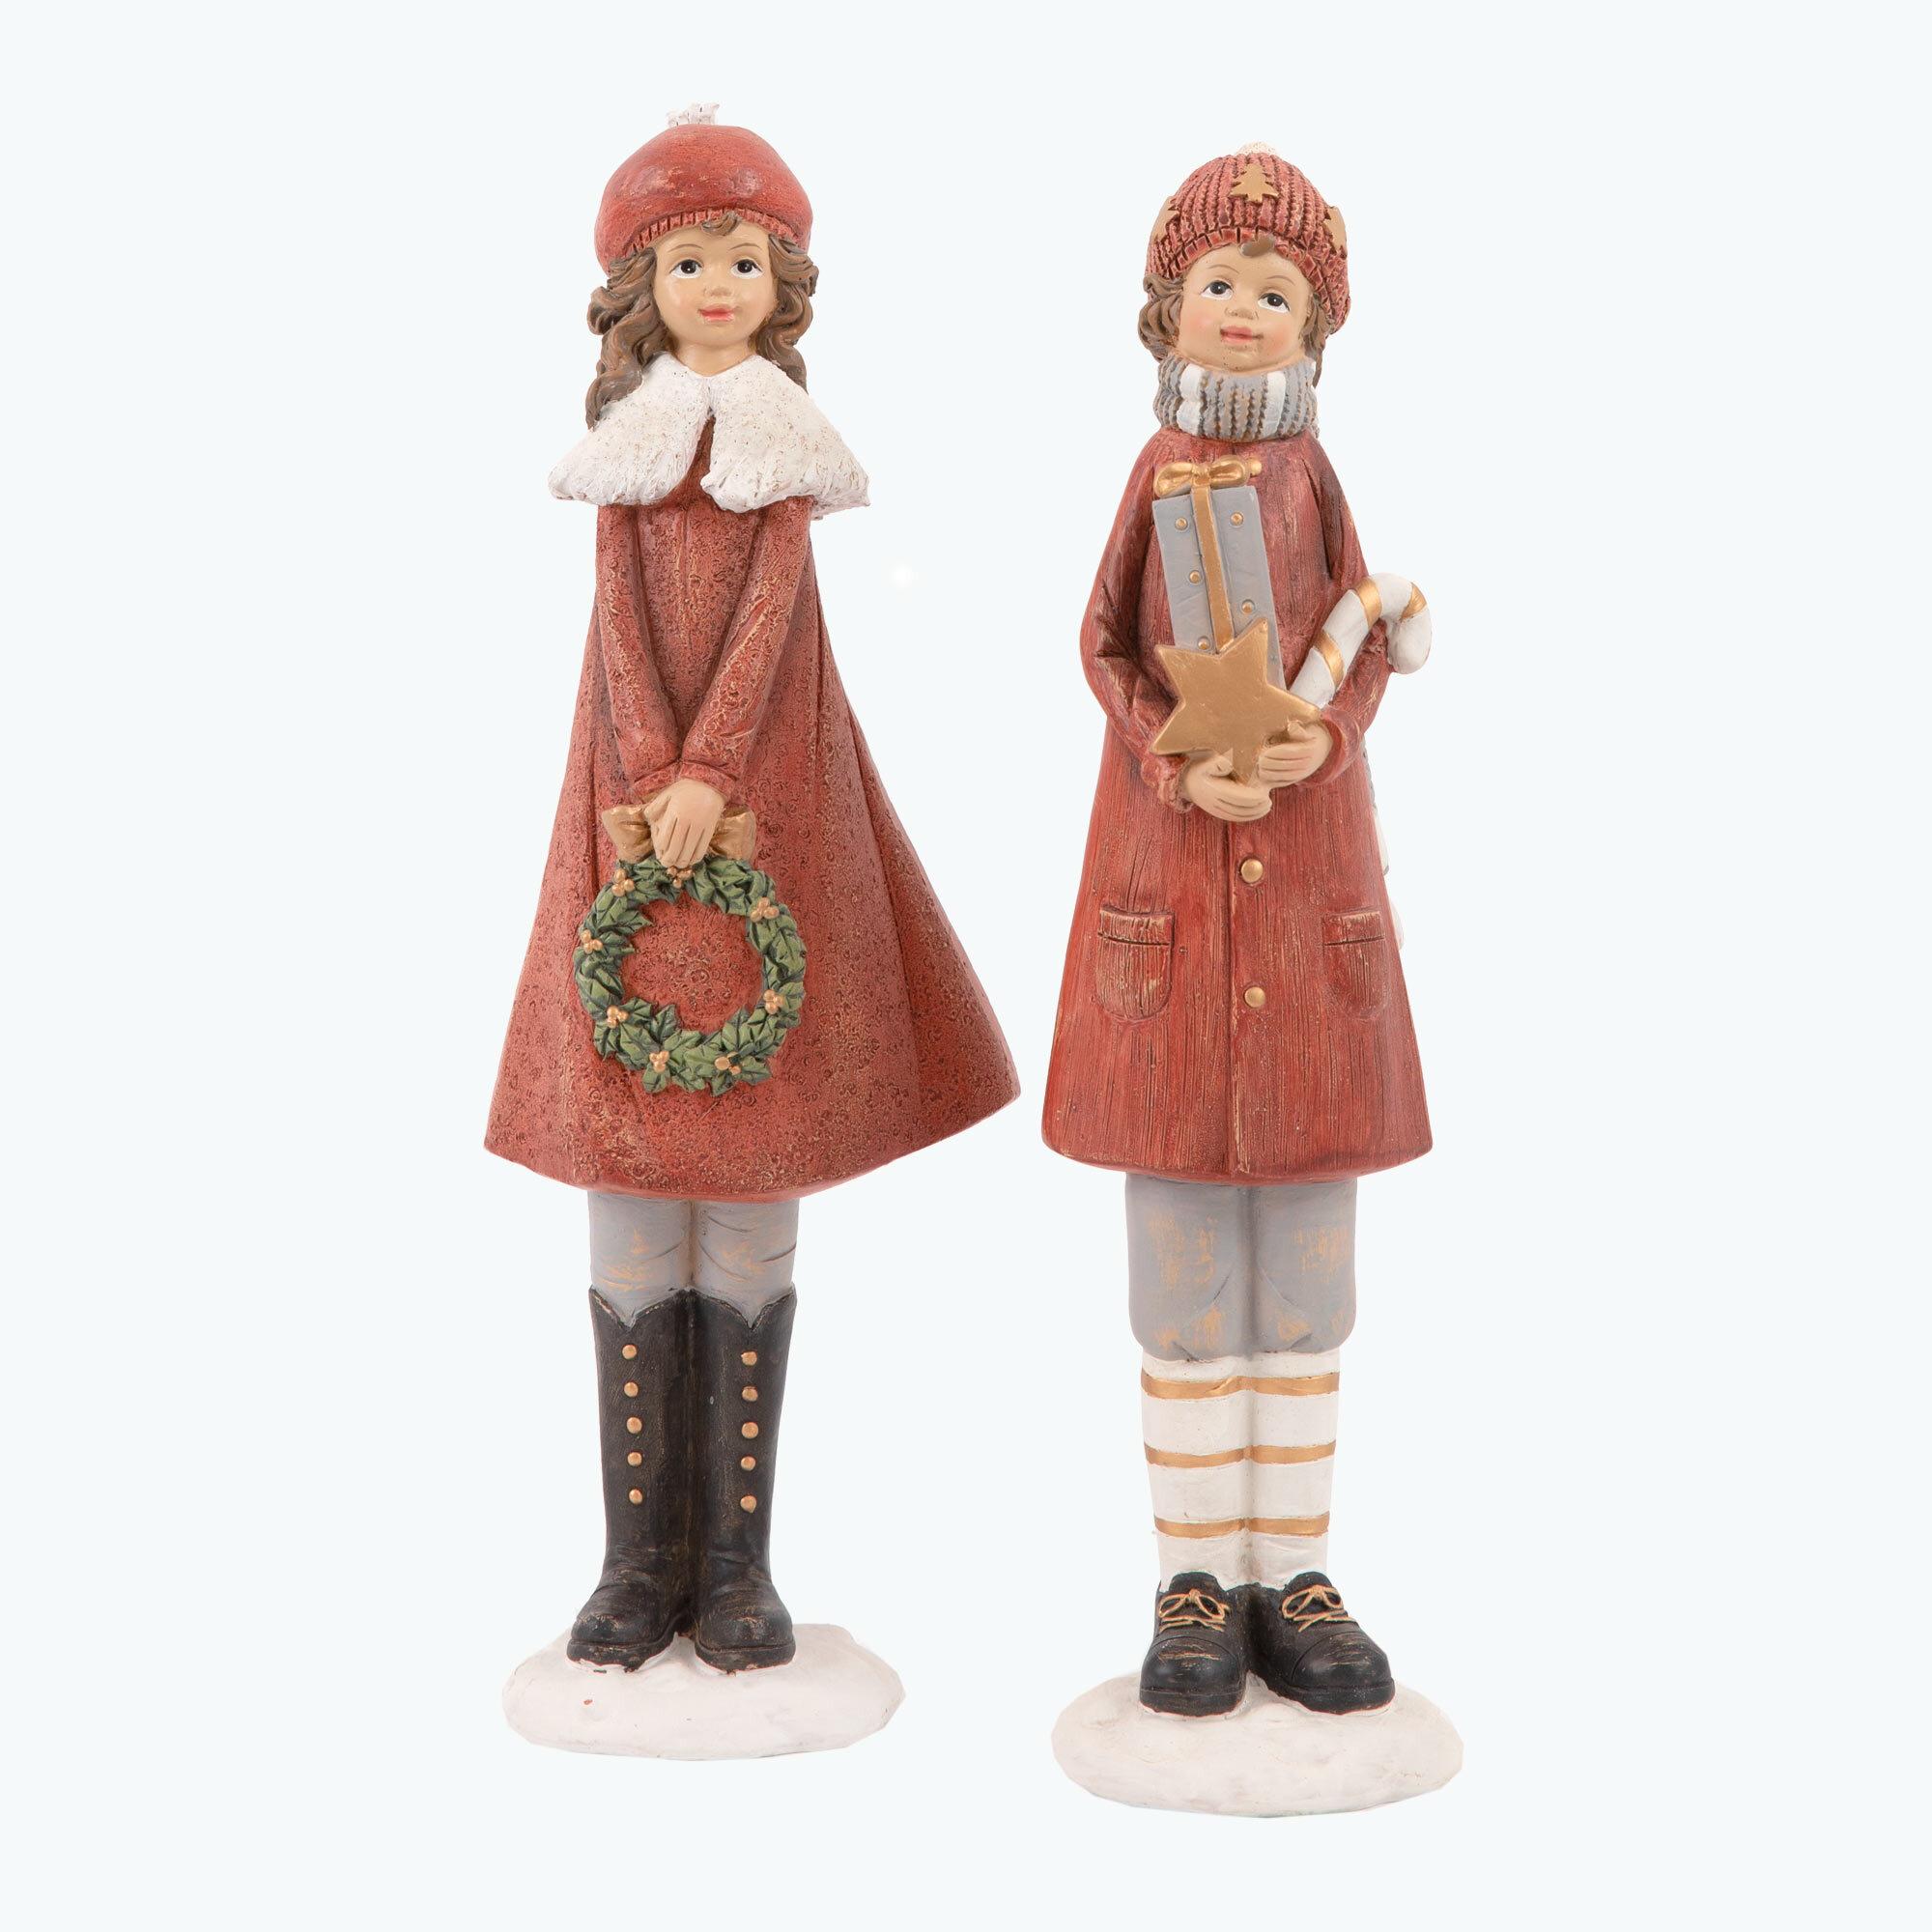 Spirit of Christmas figur sett à 2